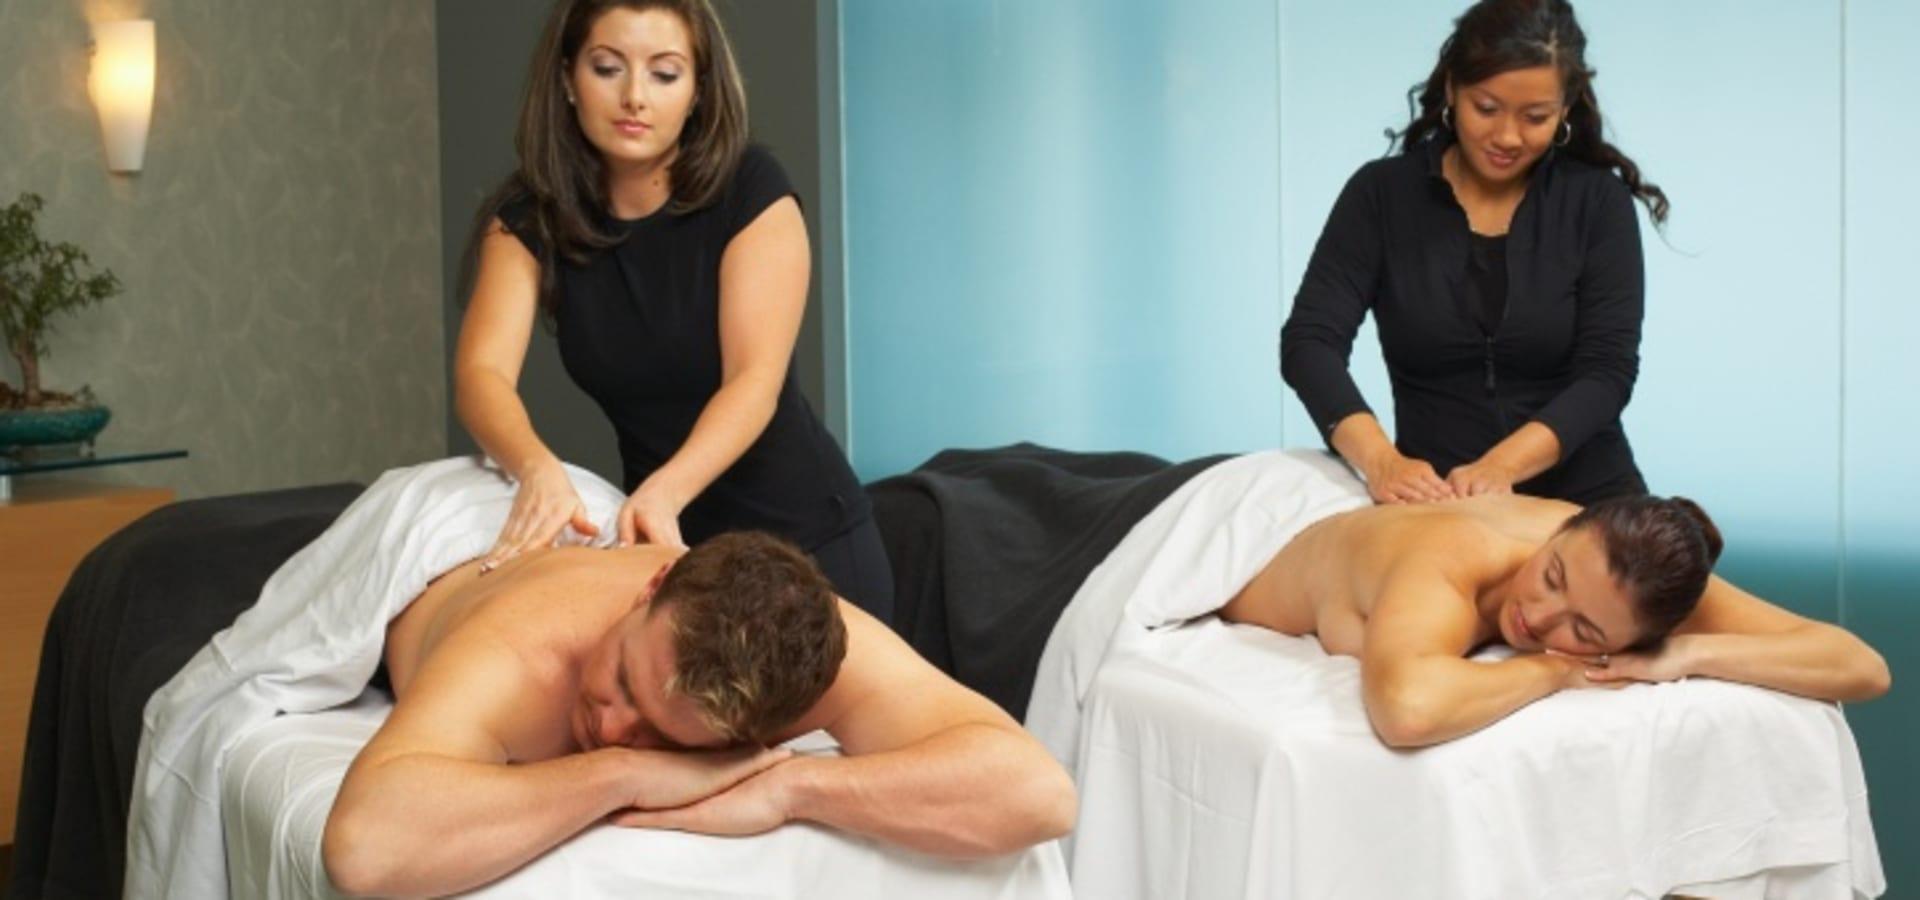 Why have got a Skilled Massage? Massage Edmonton South